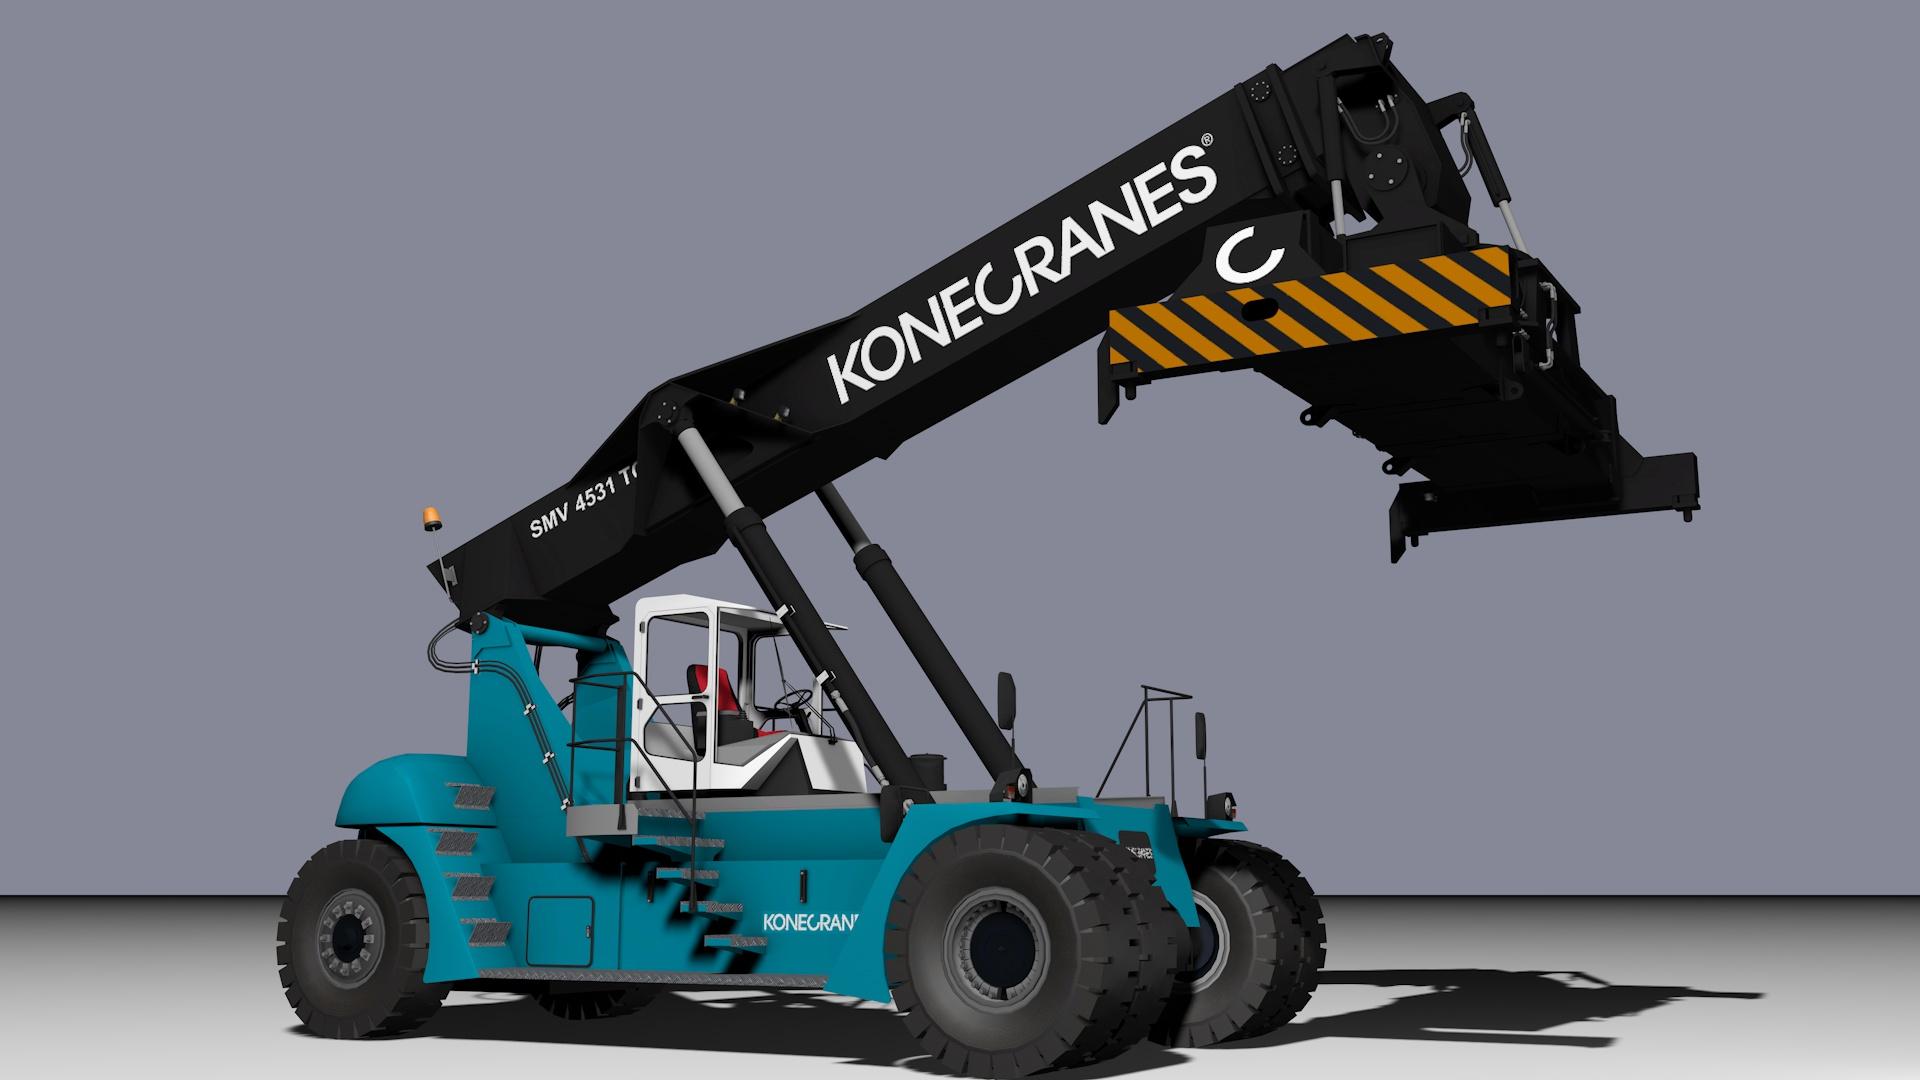 [W.I.P.] Kronecranes SMV + Contenedores + Remolques (Actualizado 26/5/2018) Foto145wqjg